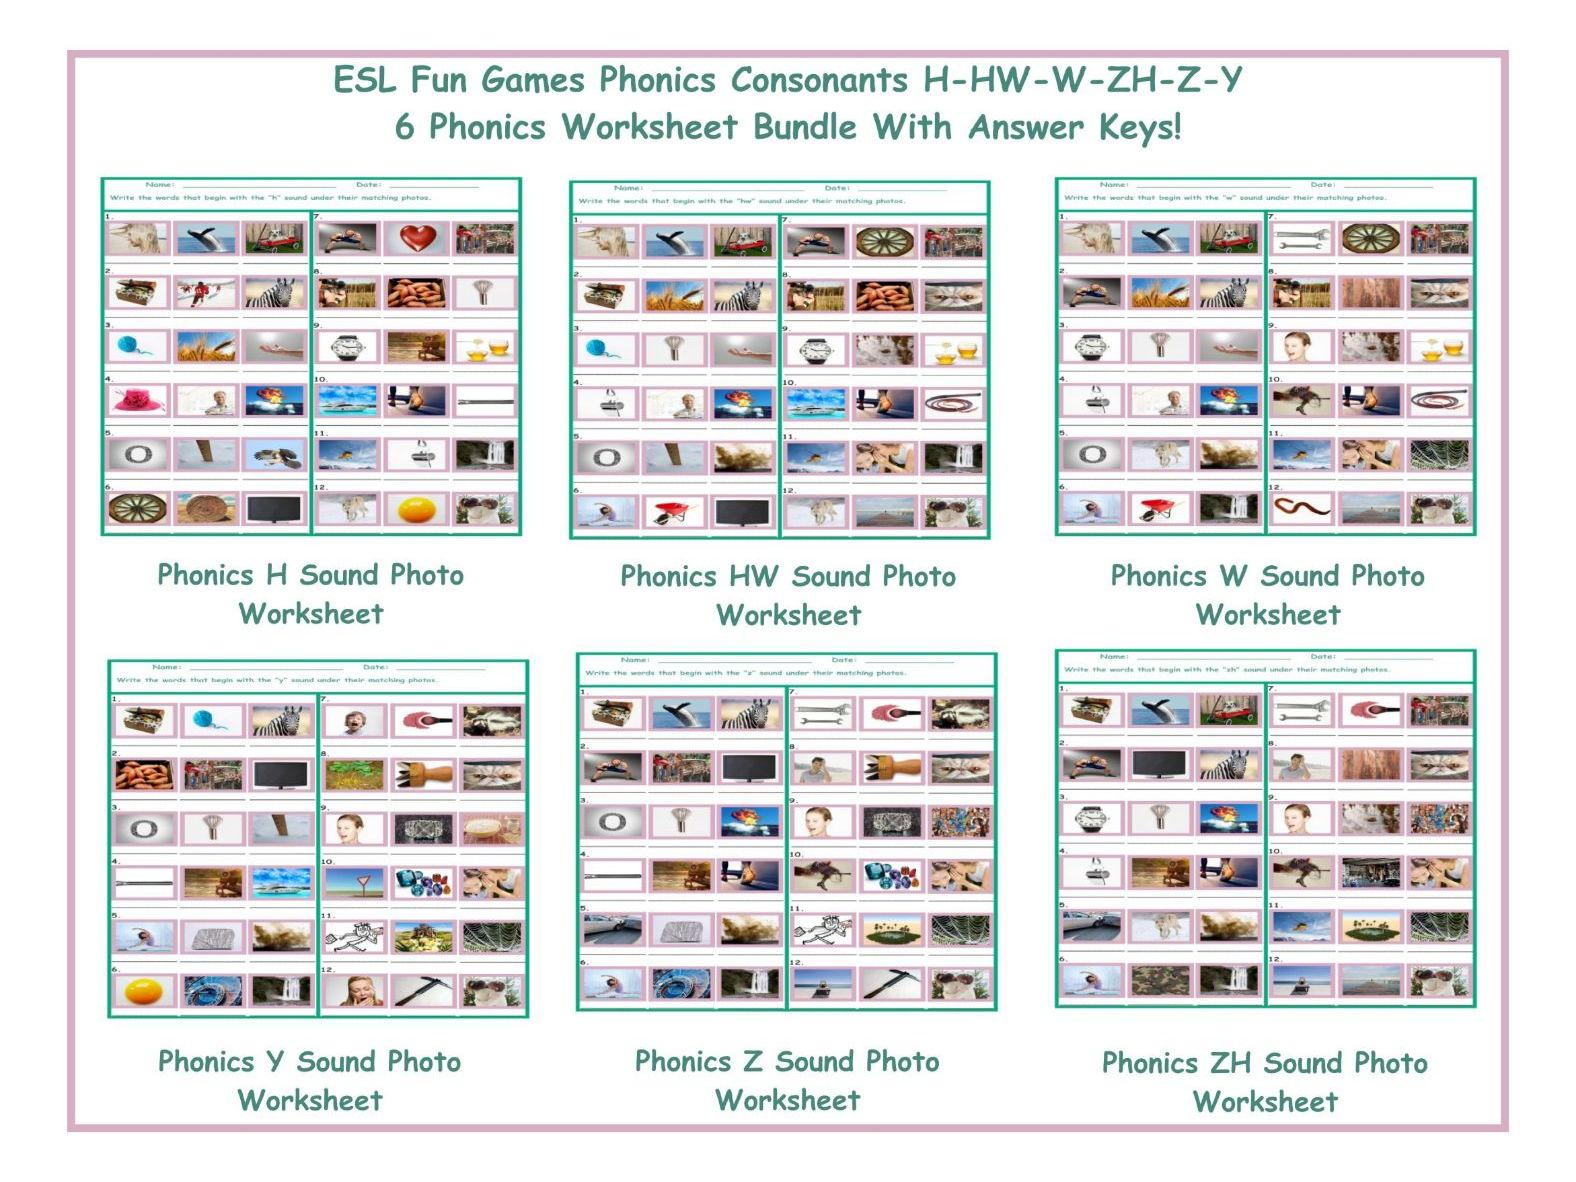 Phonics Consonants M N Q R V X 6 Worksheet Bundle By